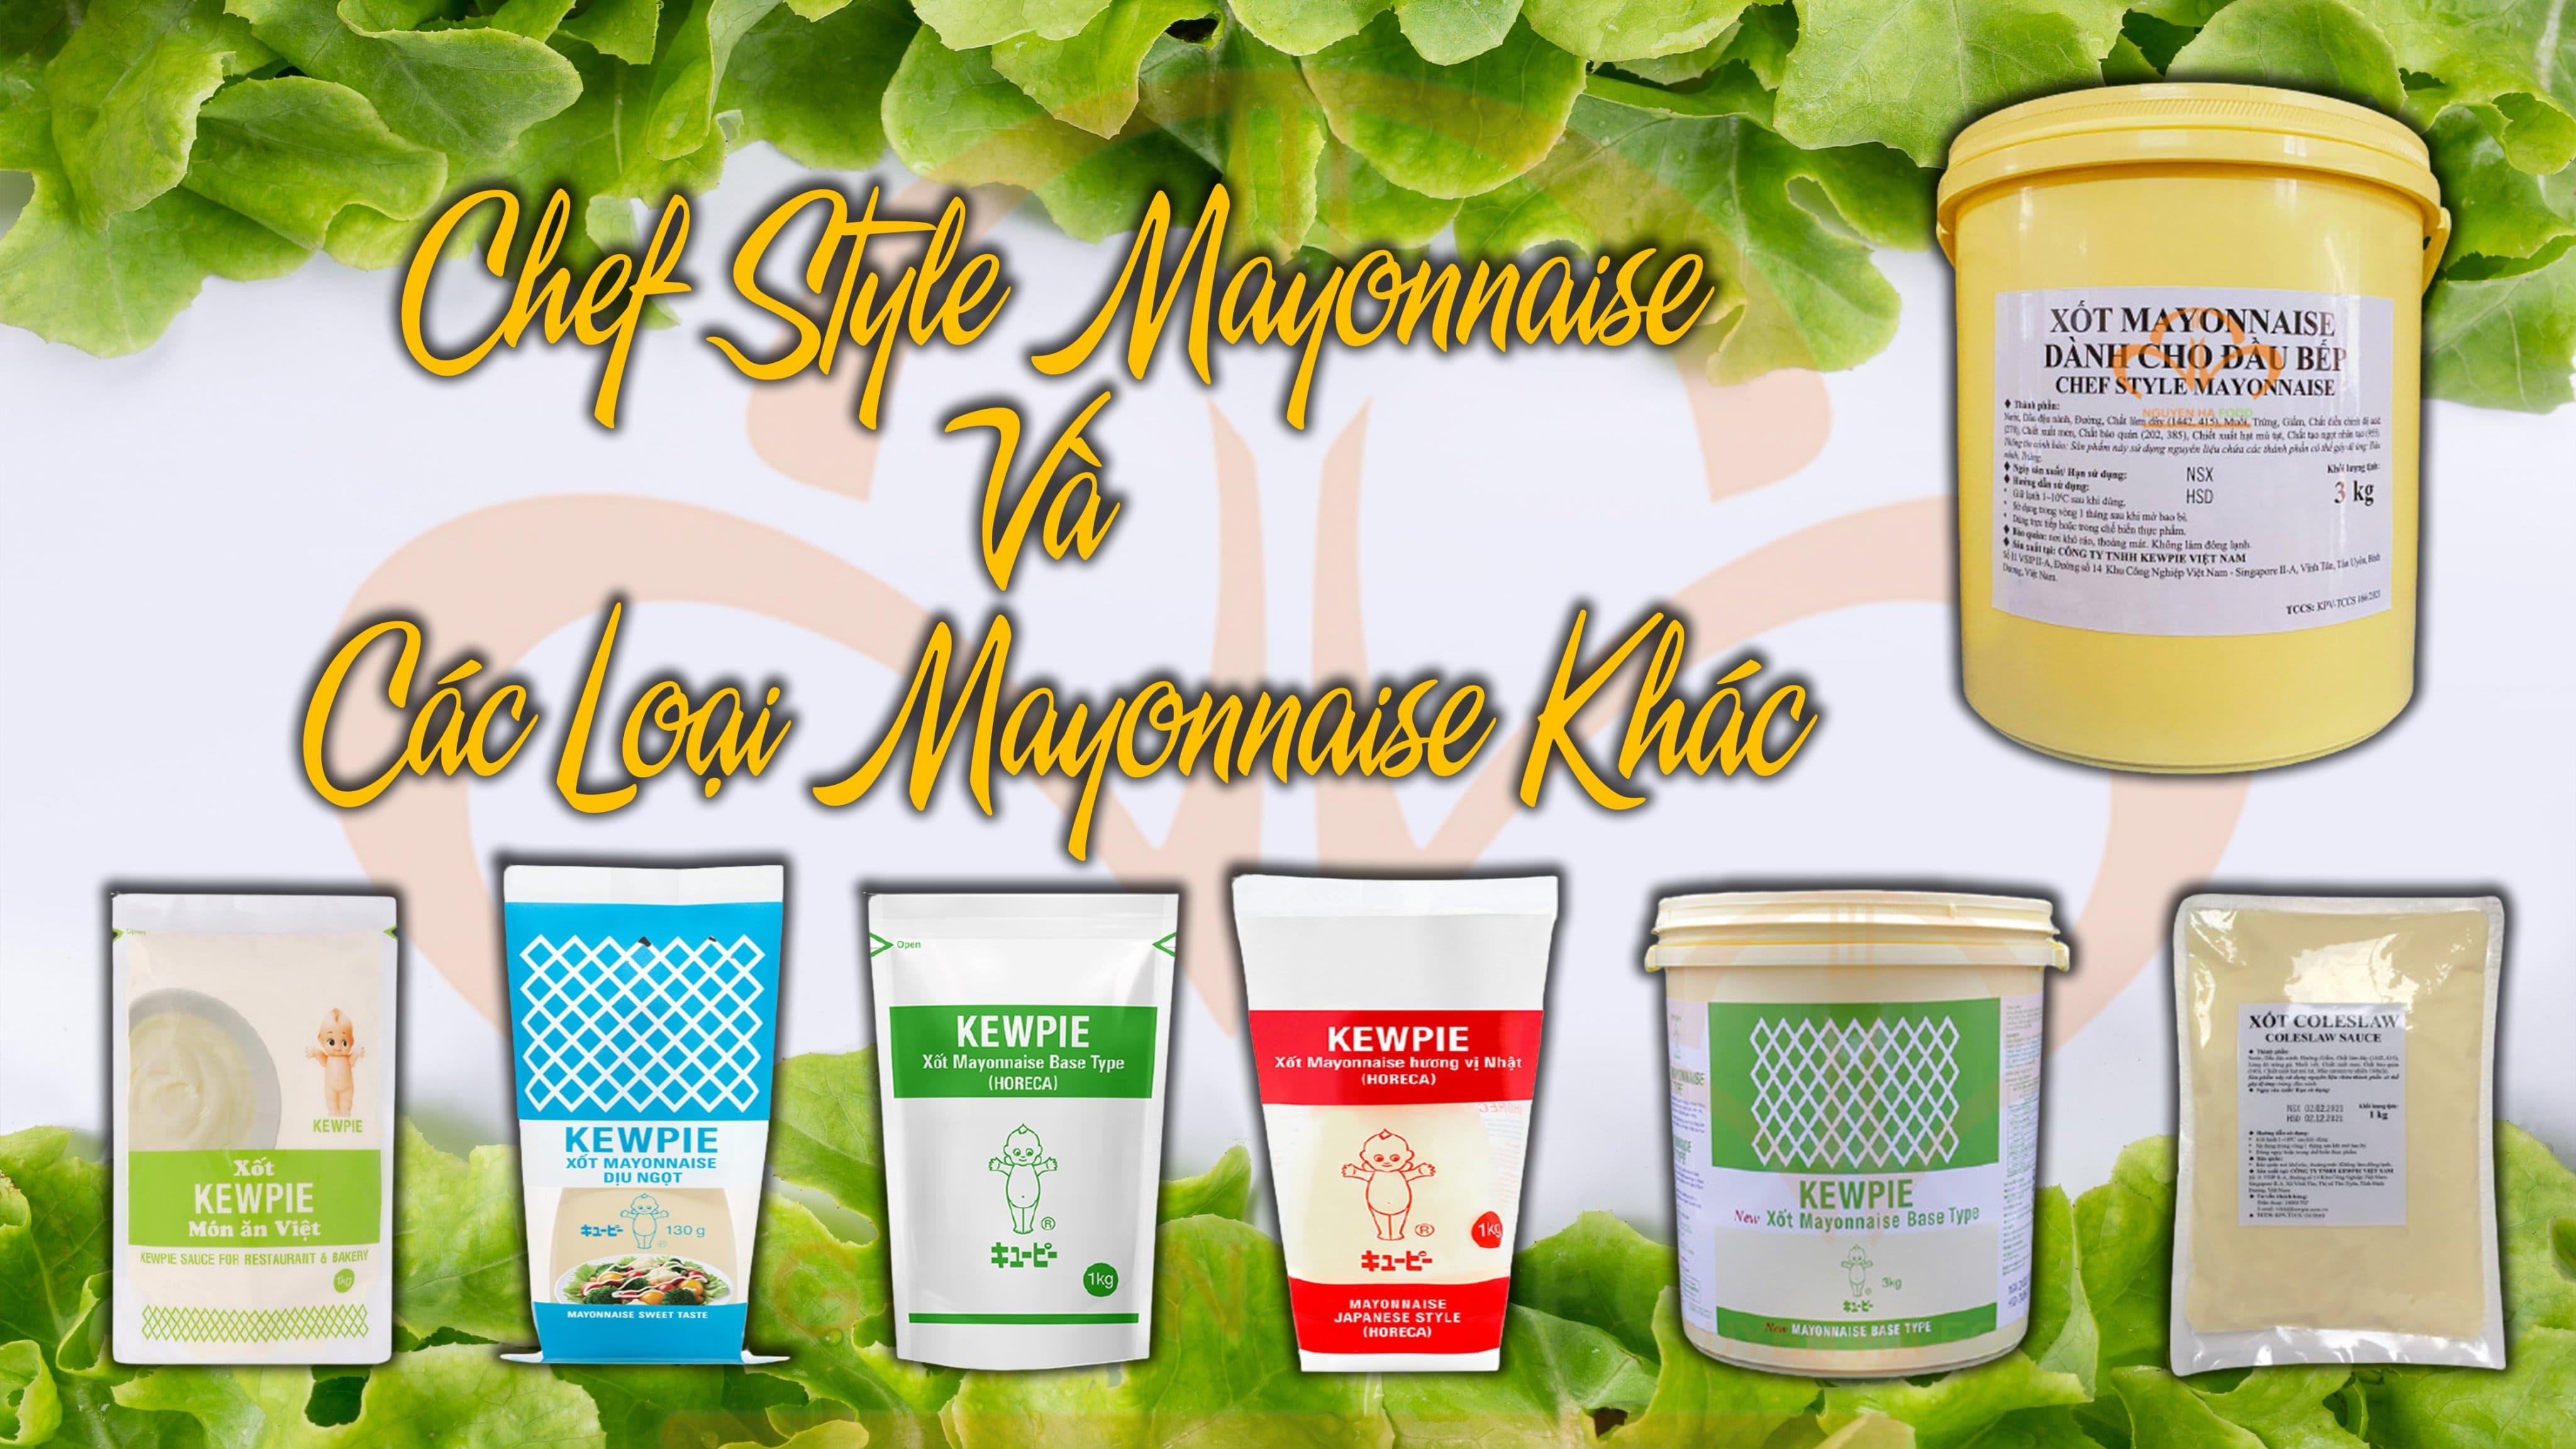 xot-mayonnaise-chef-style-va-cac-loại-xot-mayonnaise-khac